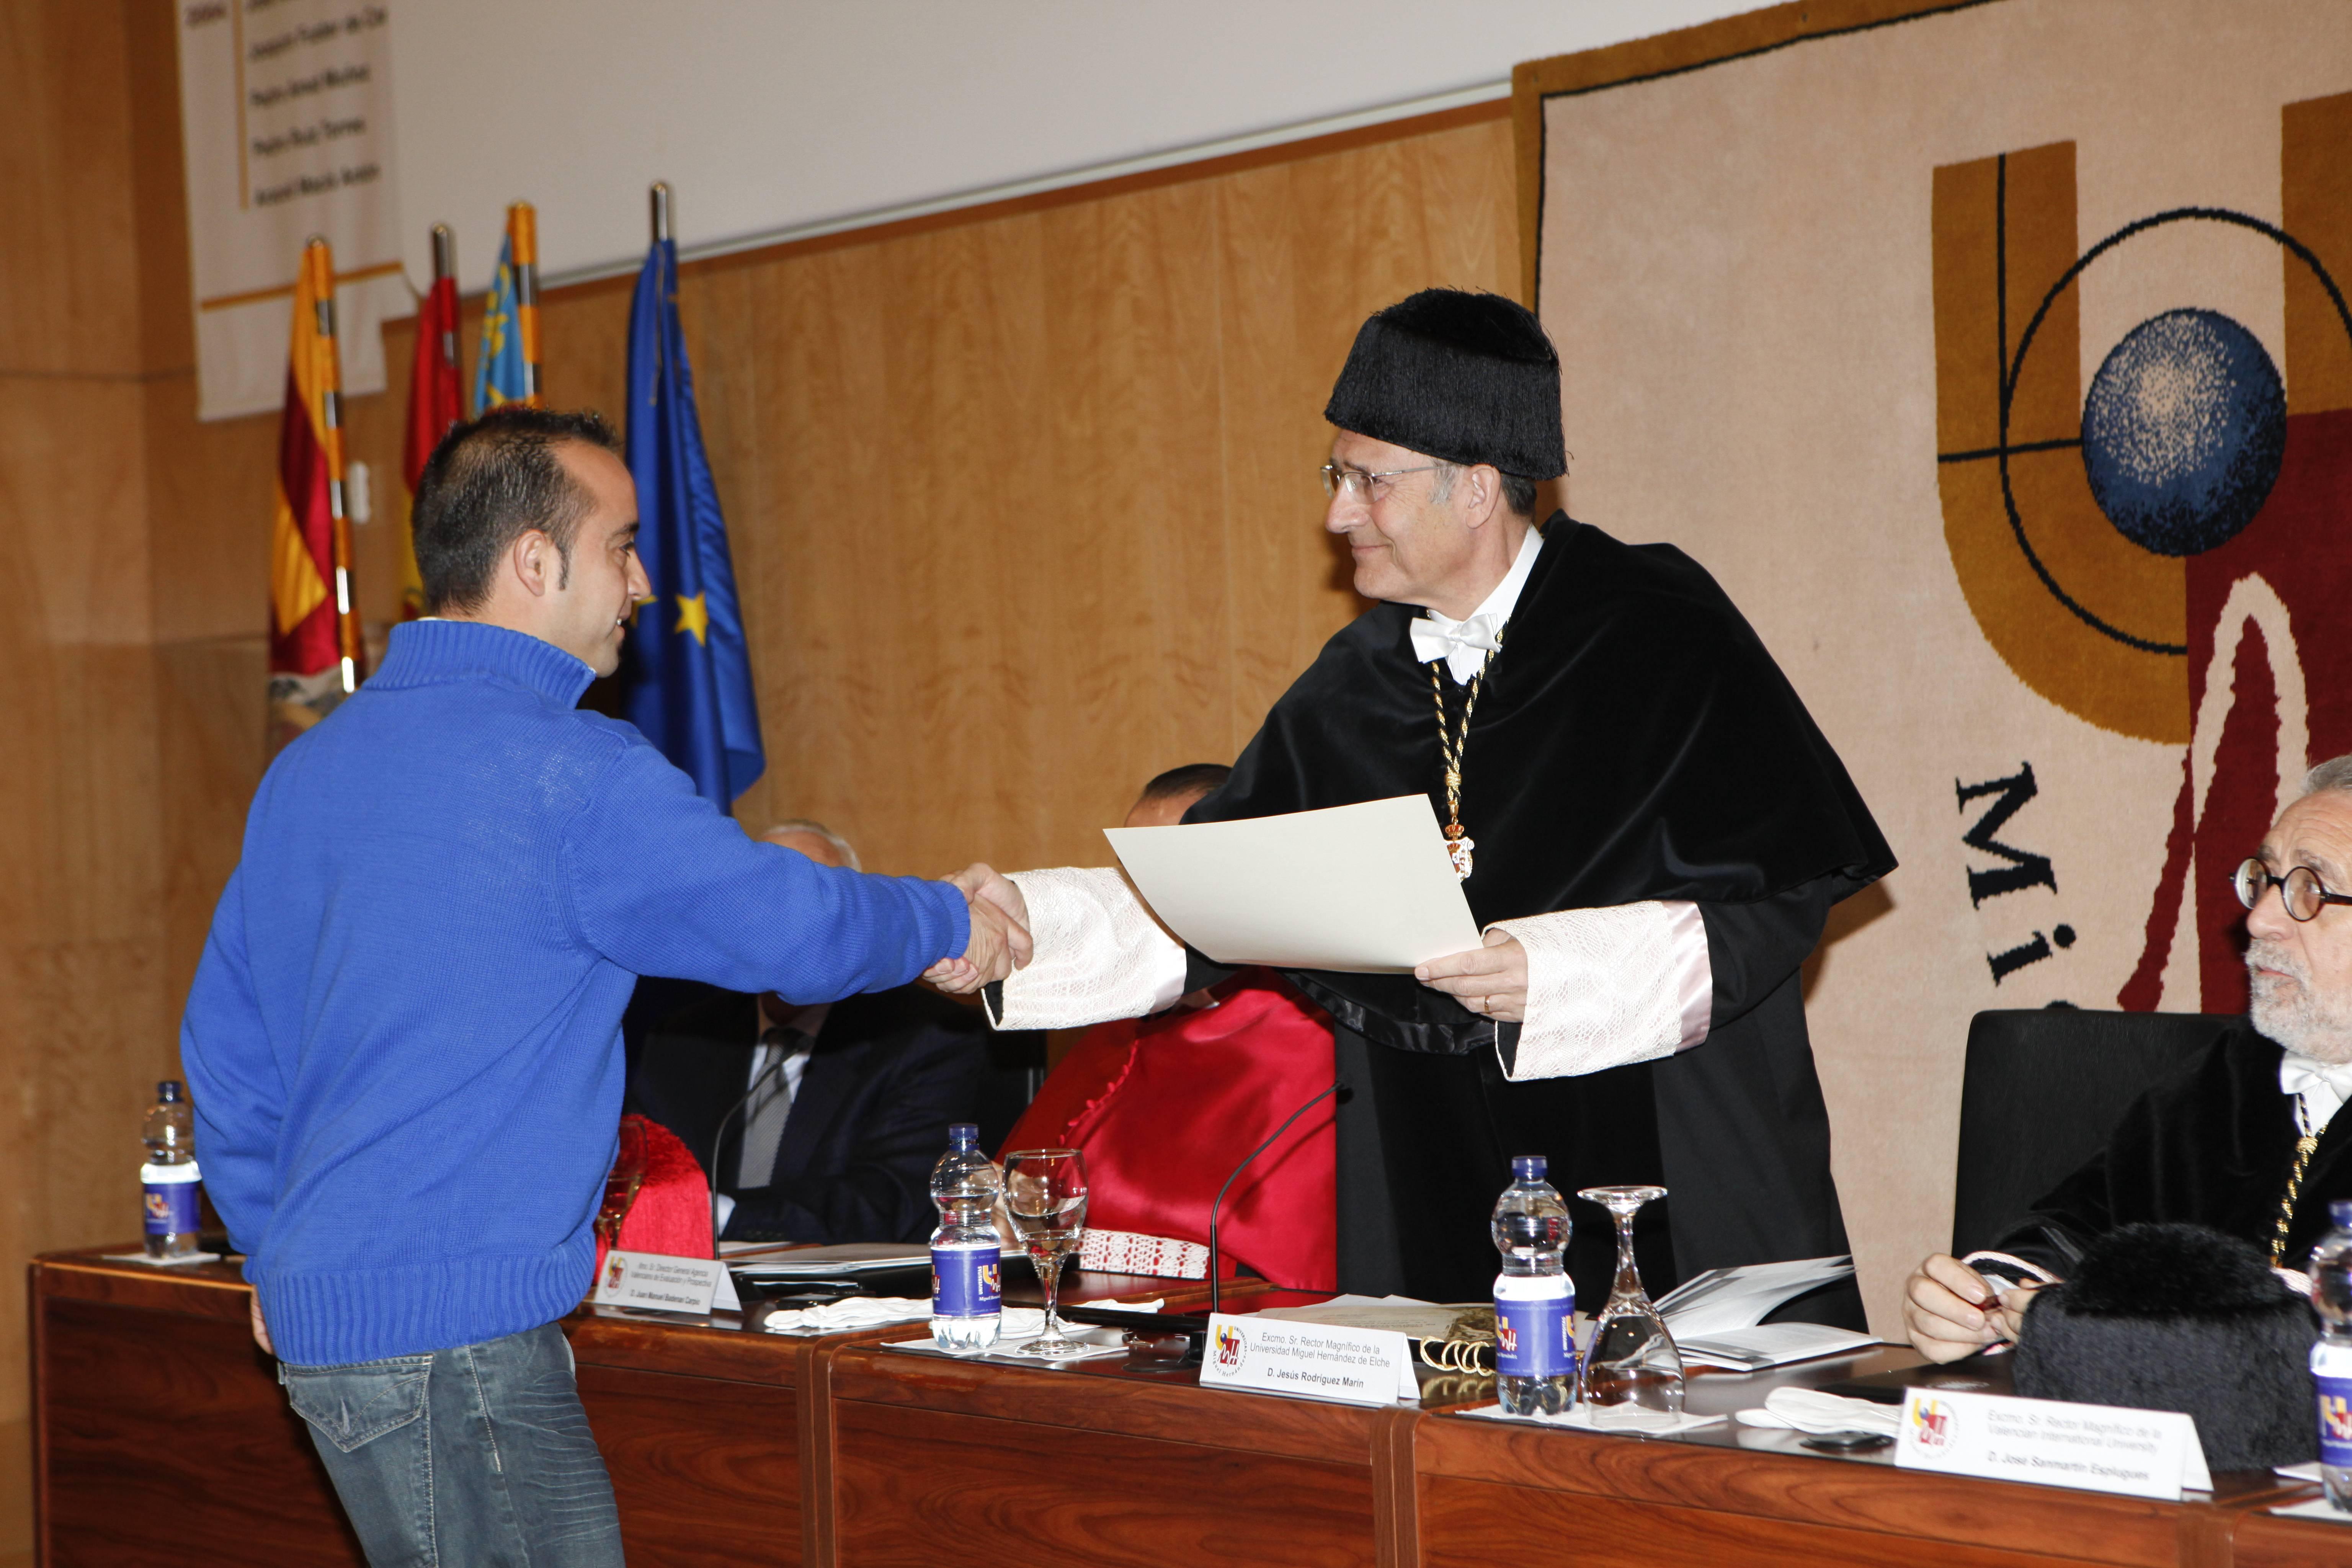 doctor-honoris-causa-luis-gamir_mg_0942.jpg